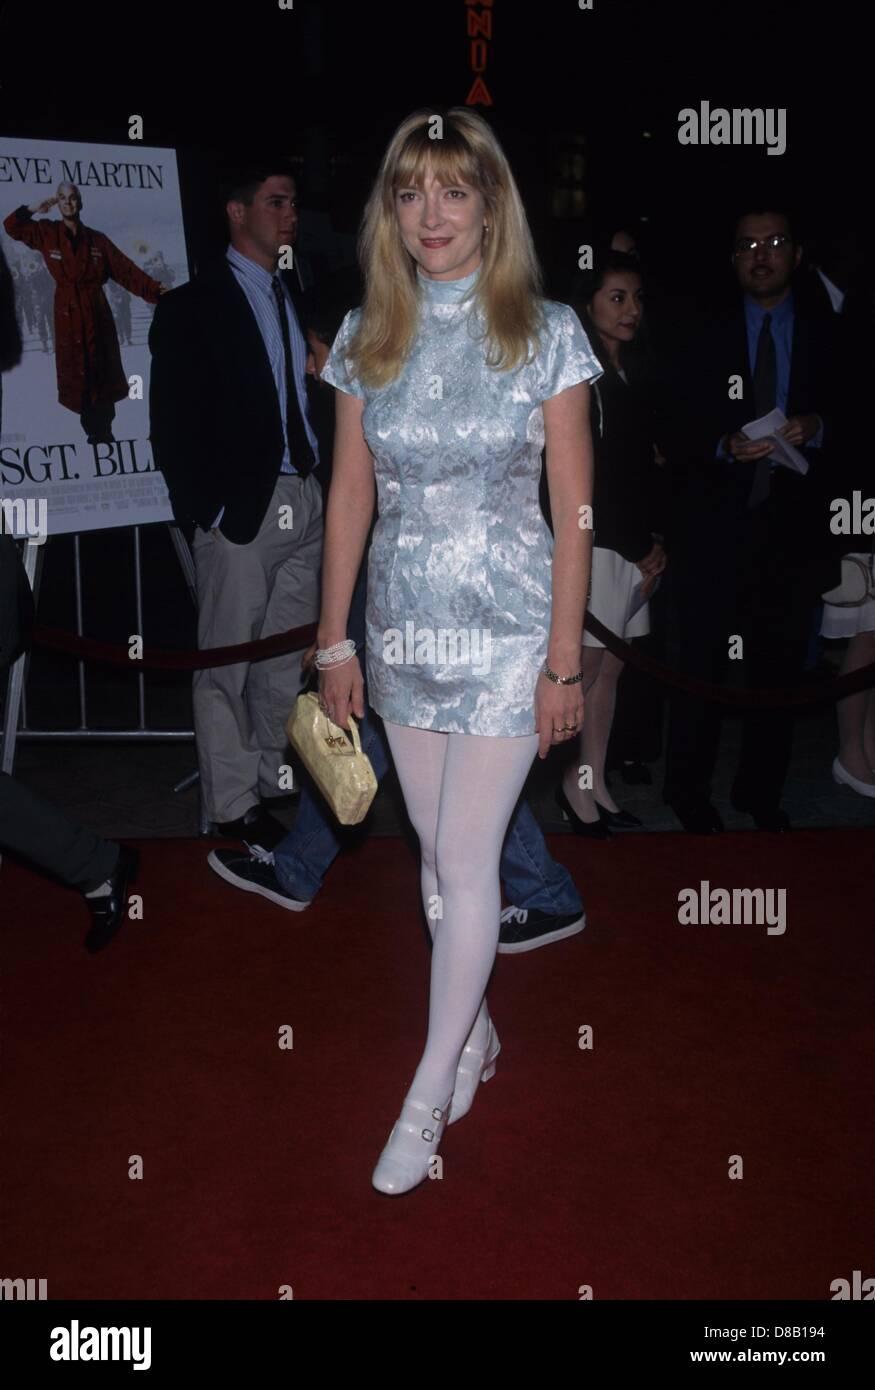 GLENNE HEADLY at the SGT. BILKO premiere 1996.k4392fb.(Credit Image: © Fitzroy Barrett/Globe Photos/ZUMAPRESS.com) - Stock Image